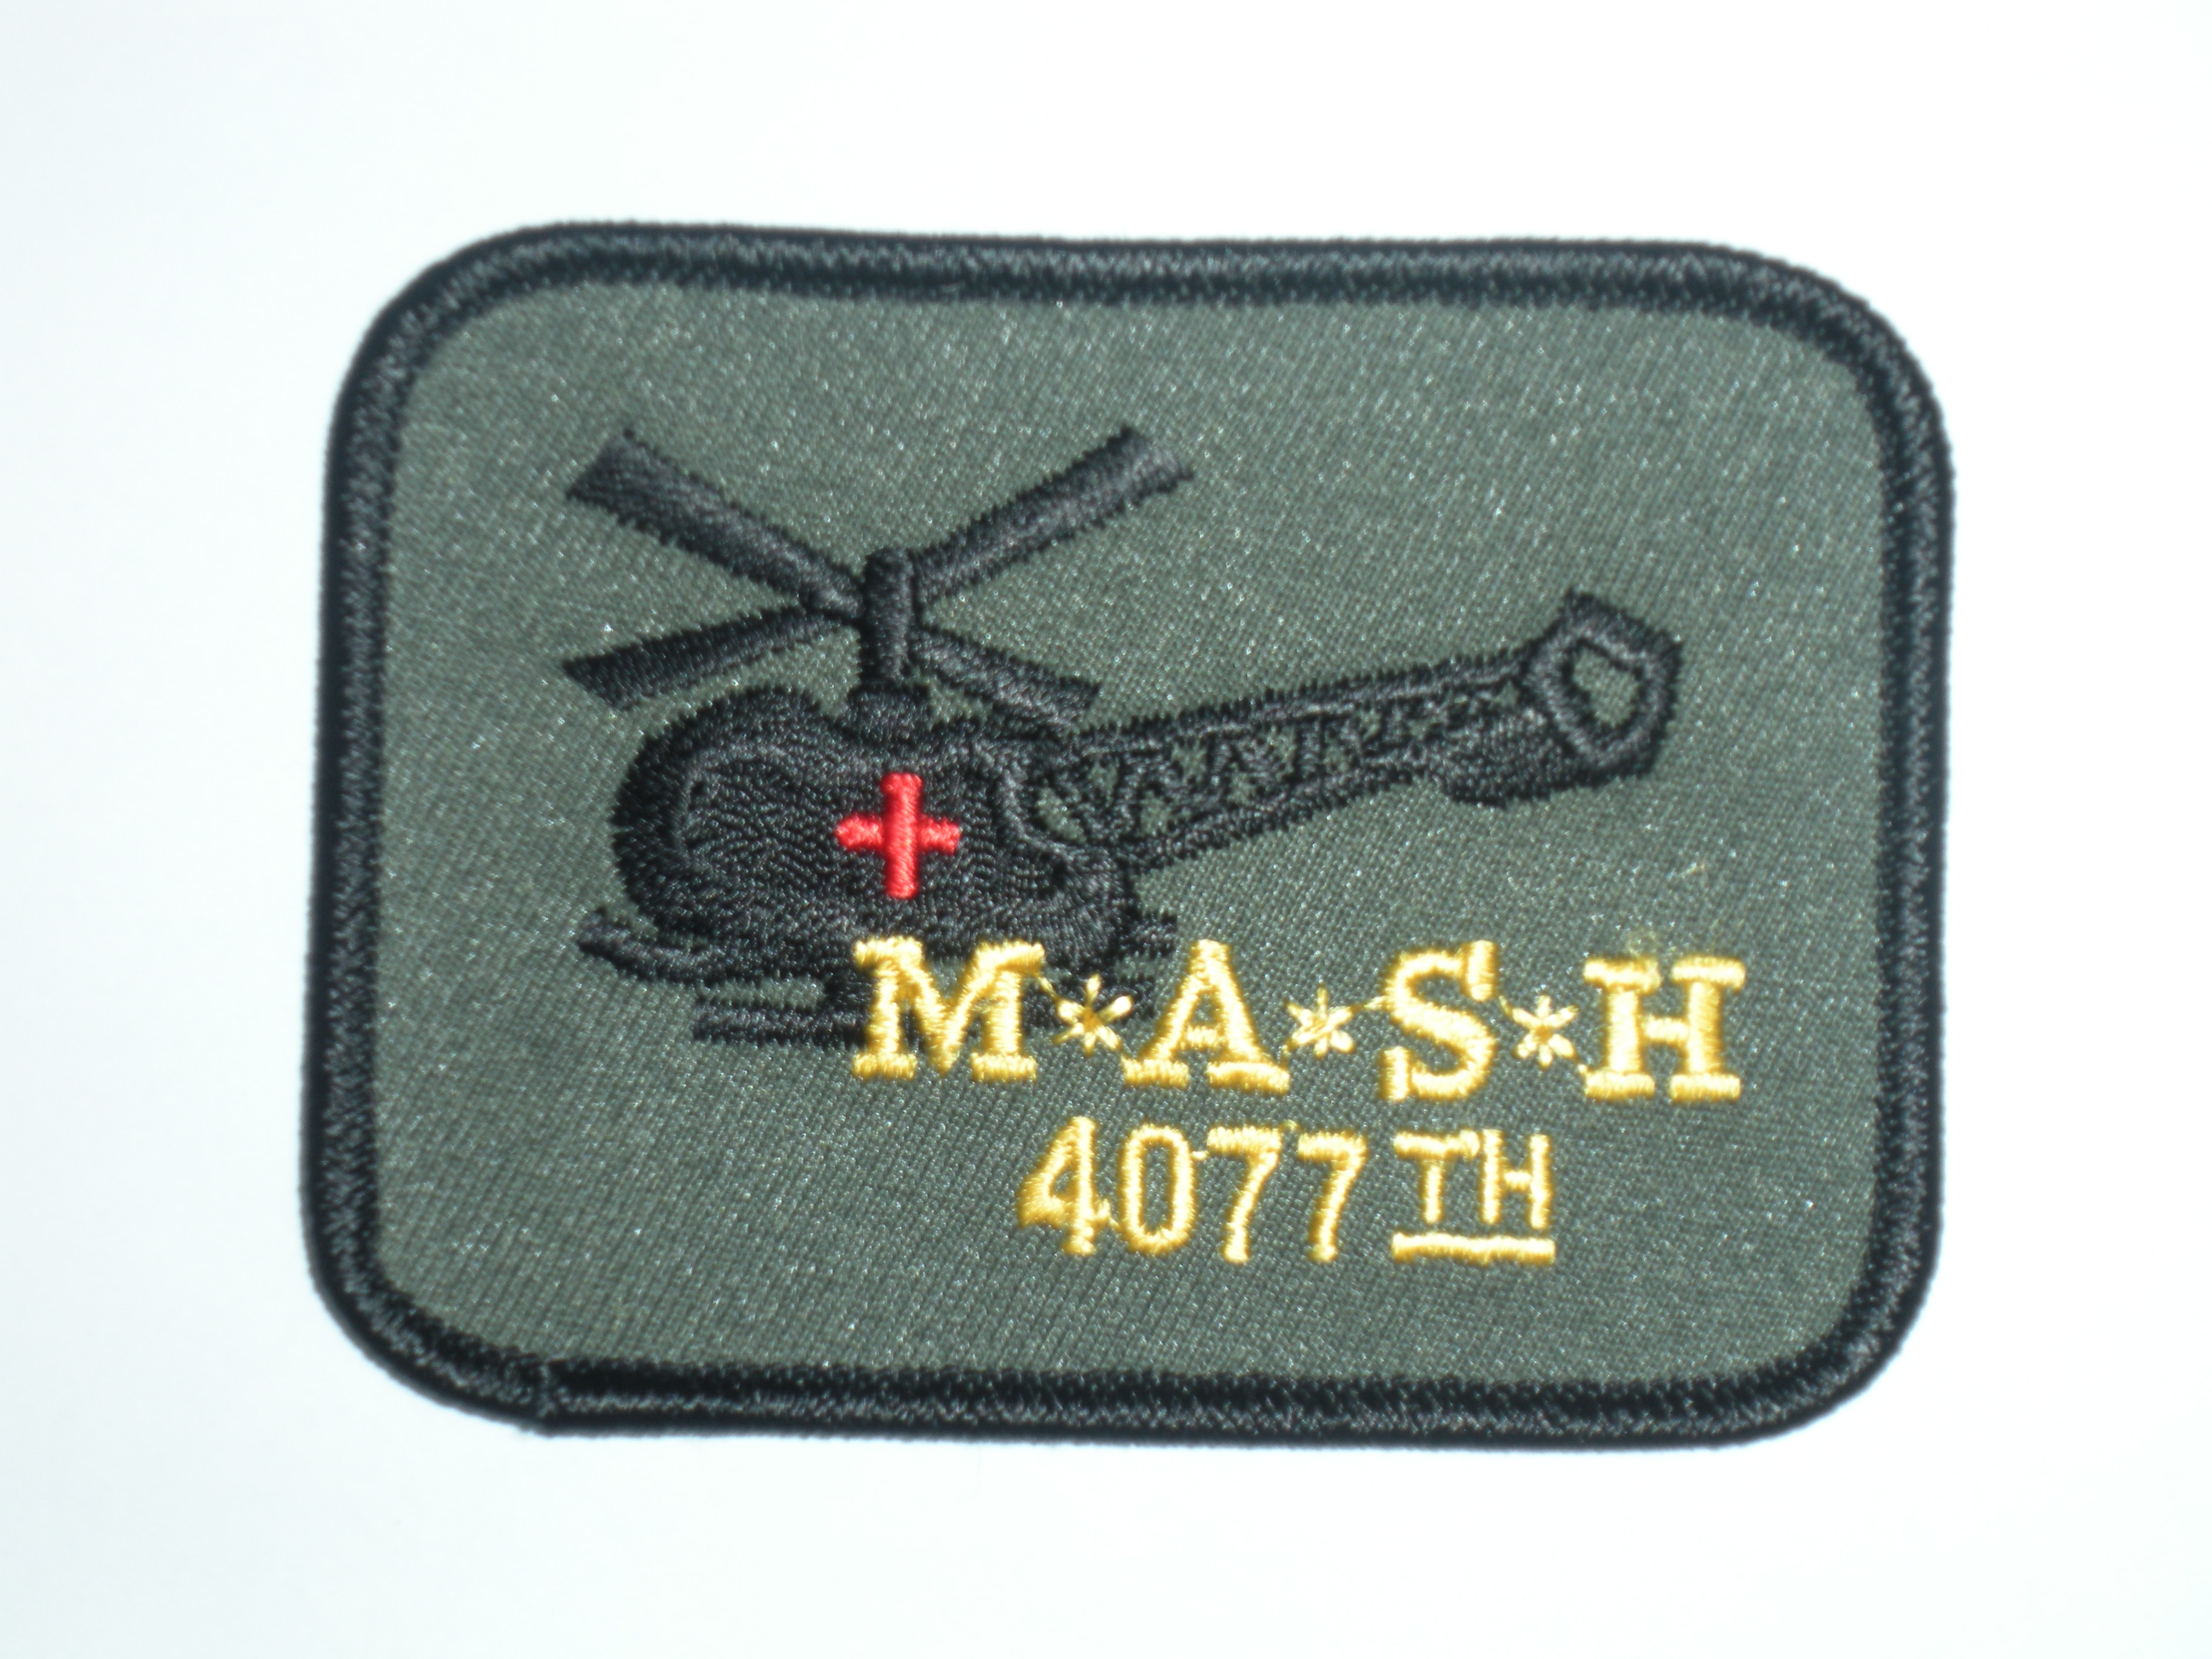 Mash Patch Northern Safari Army Navy